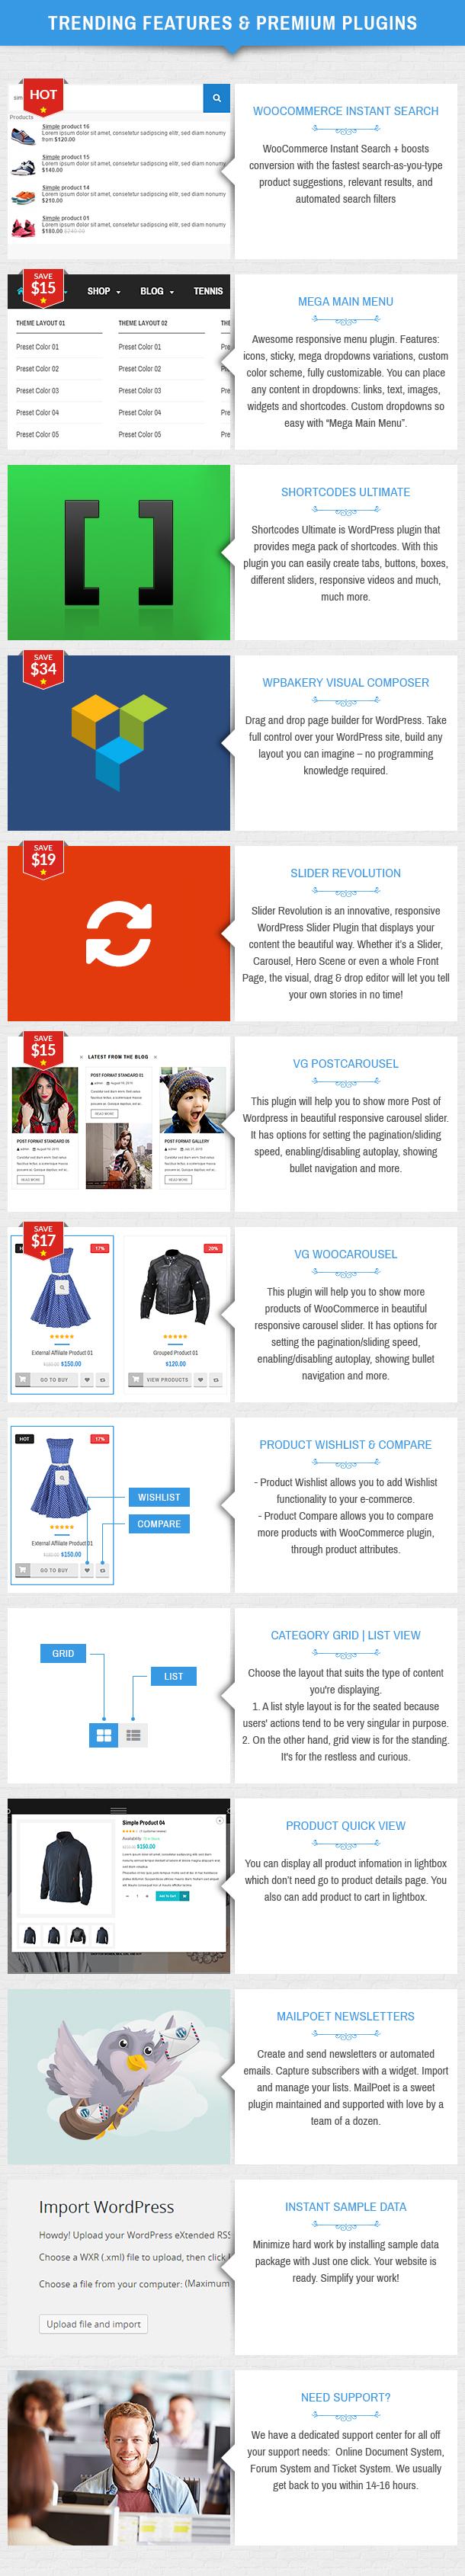 VG Matalo - eCommerce WordPress Theme for Online Store - 40